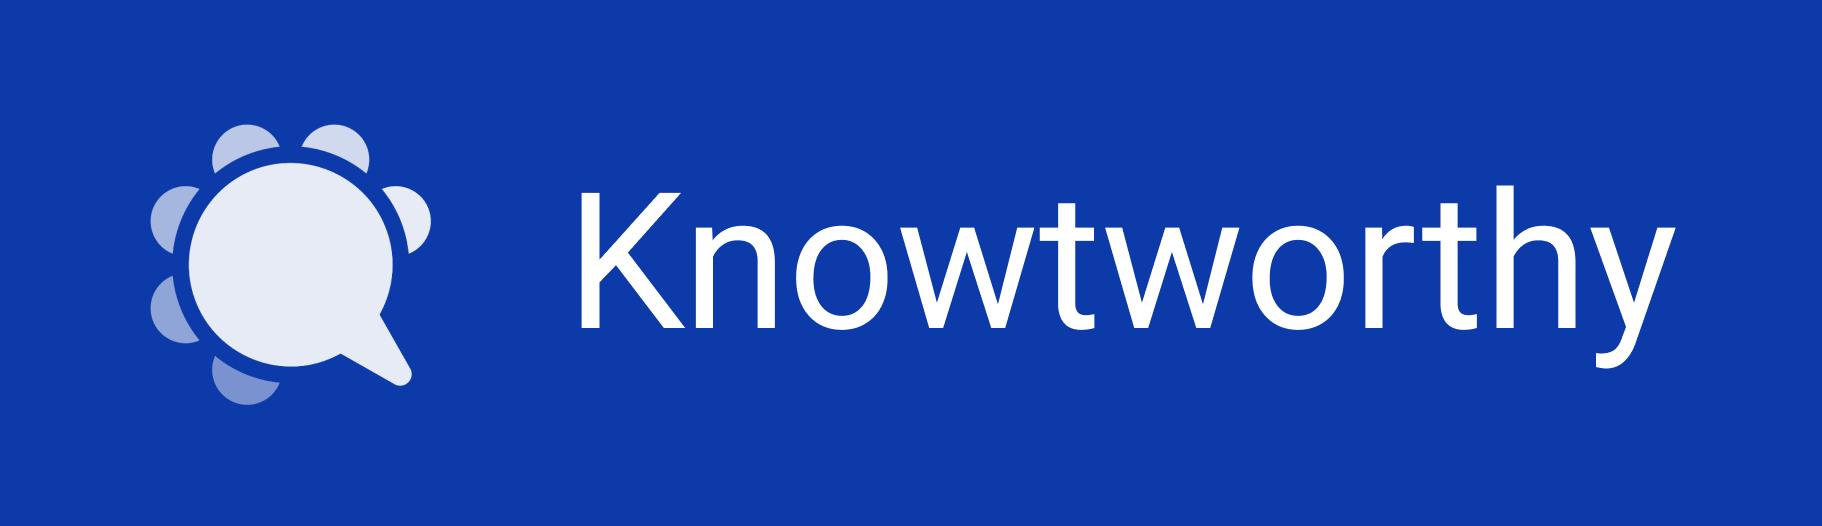 Blue Knowtworthy Logo with Company Name